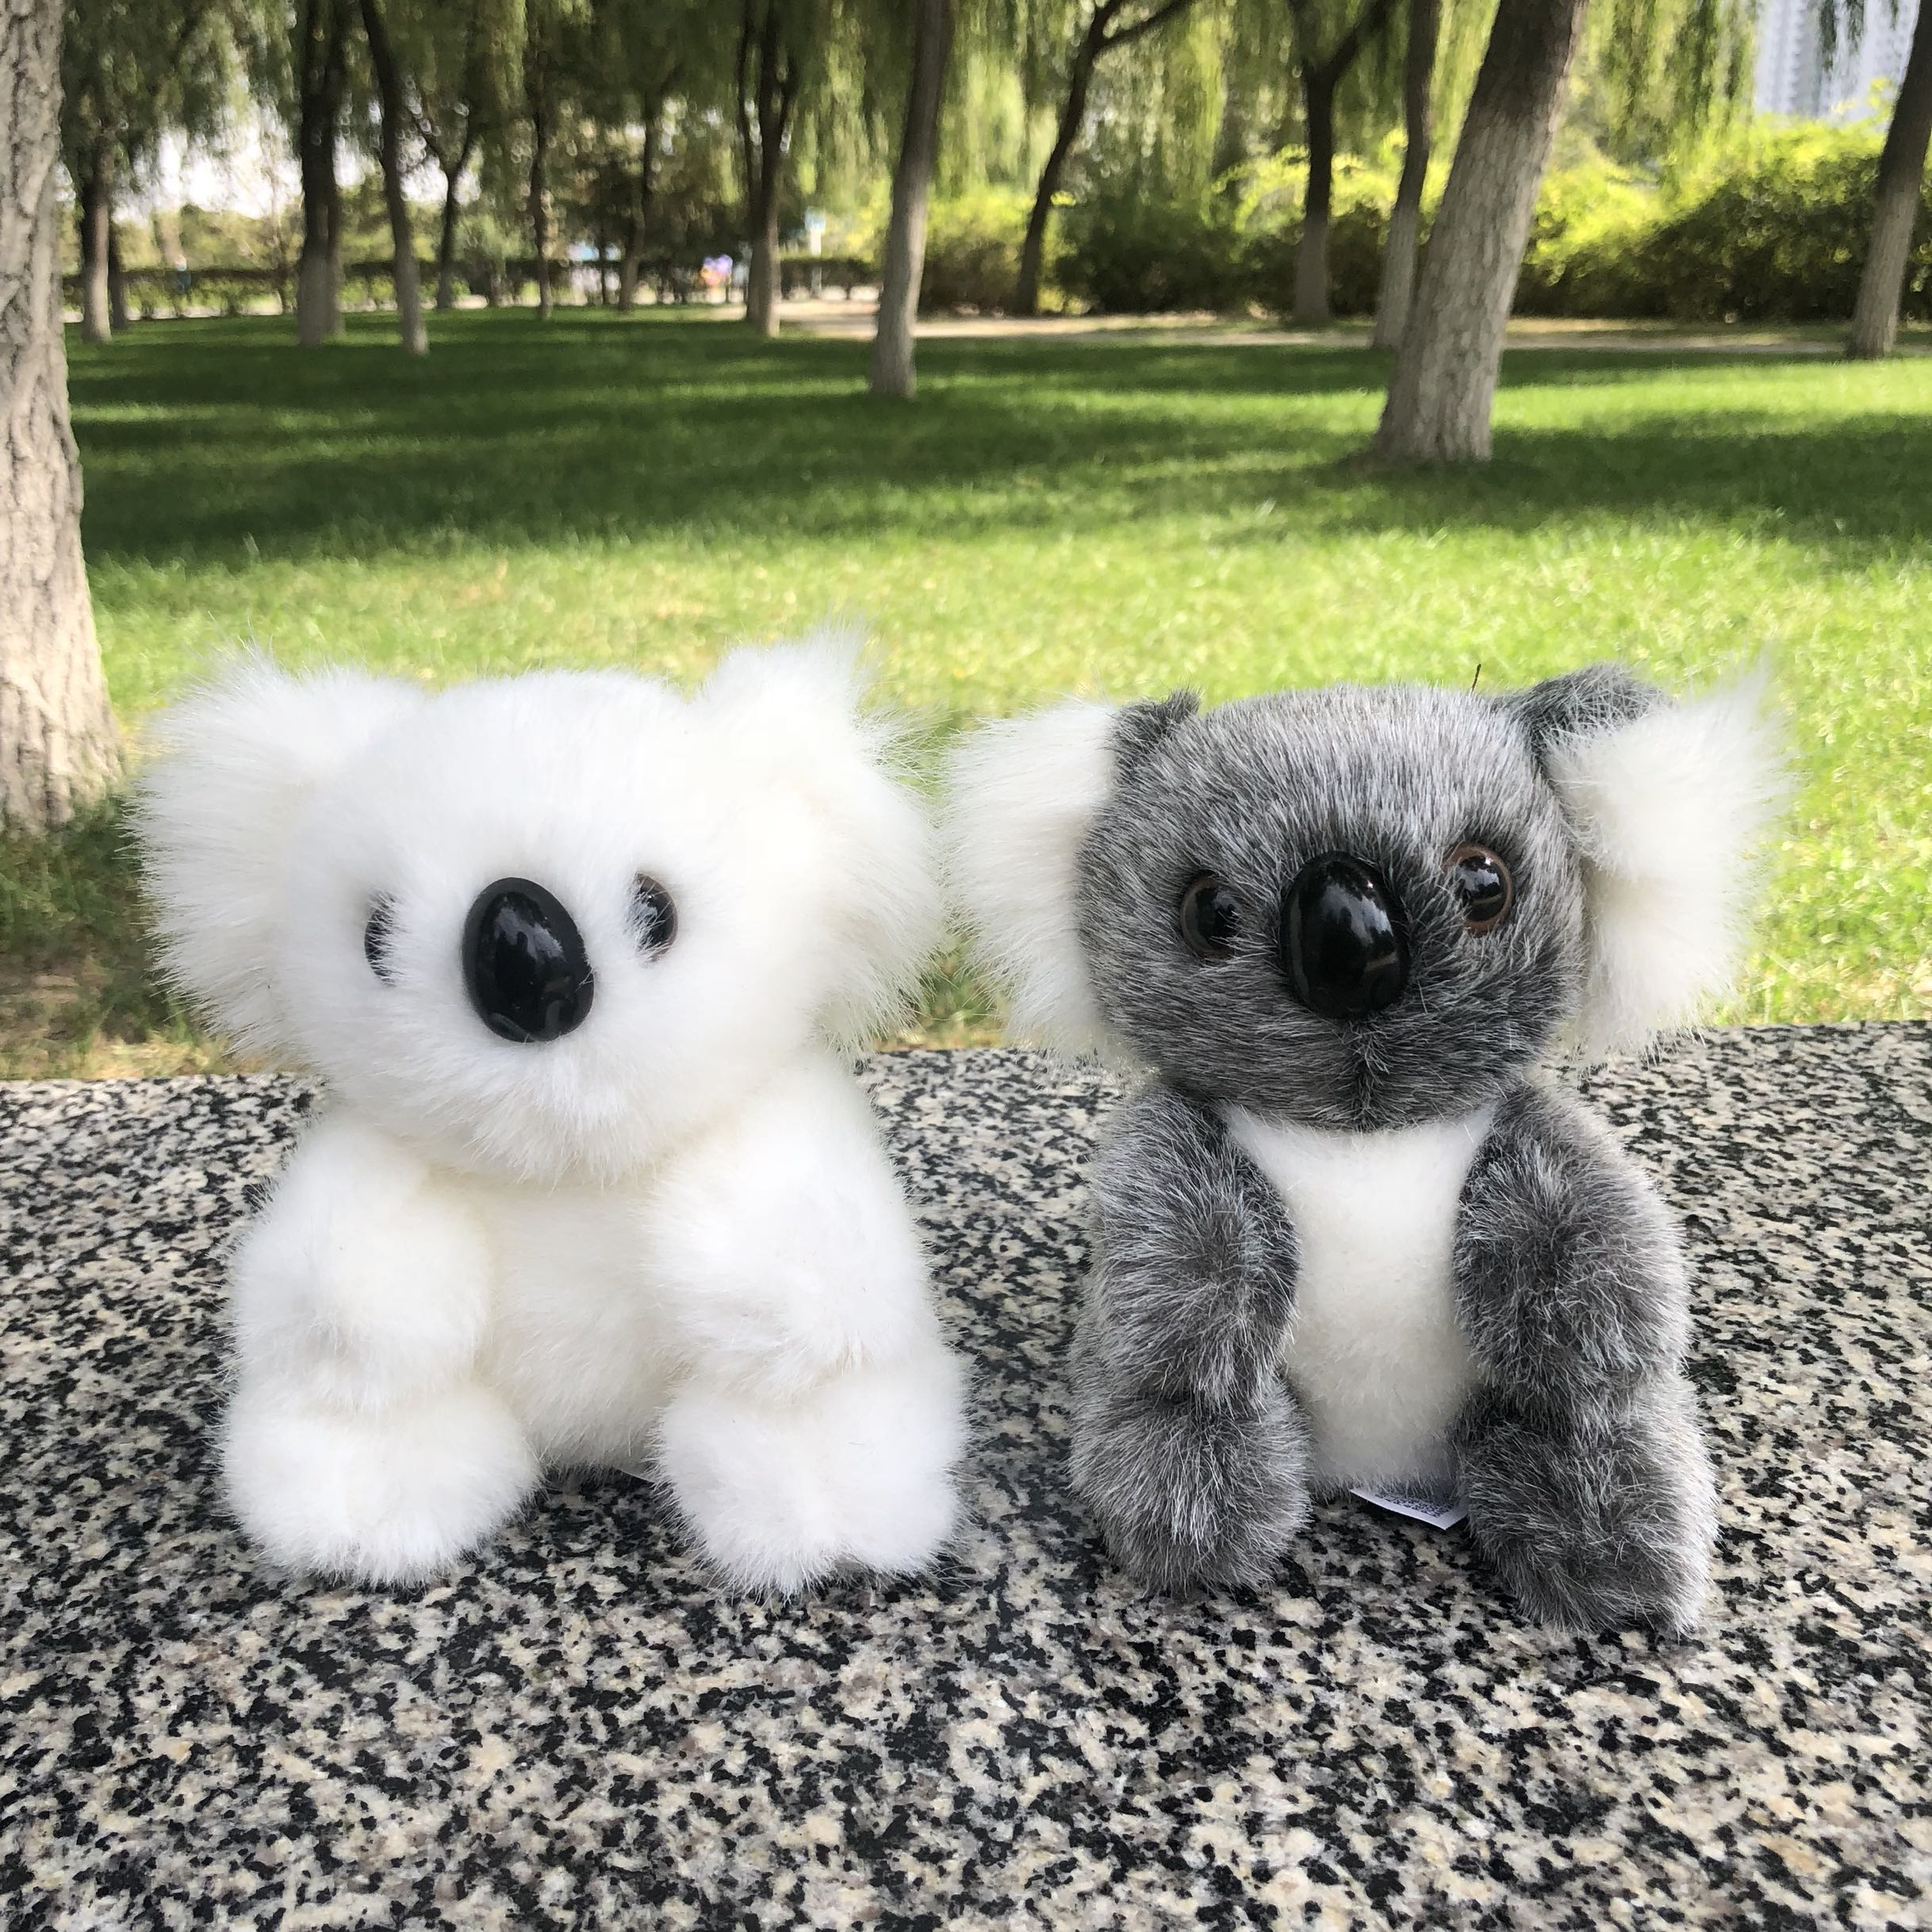 NEW 16CM New Arrival Super Cute Small Koala Bear Plush Toys Adventure Koala Doll Birthday Christmas Gift